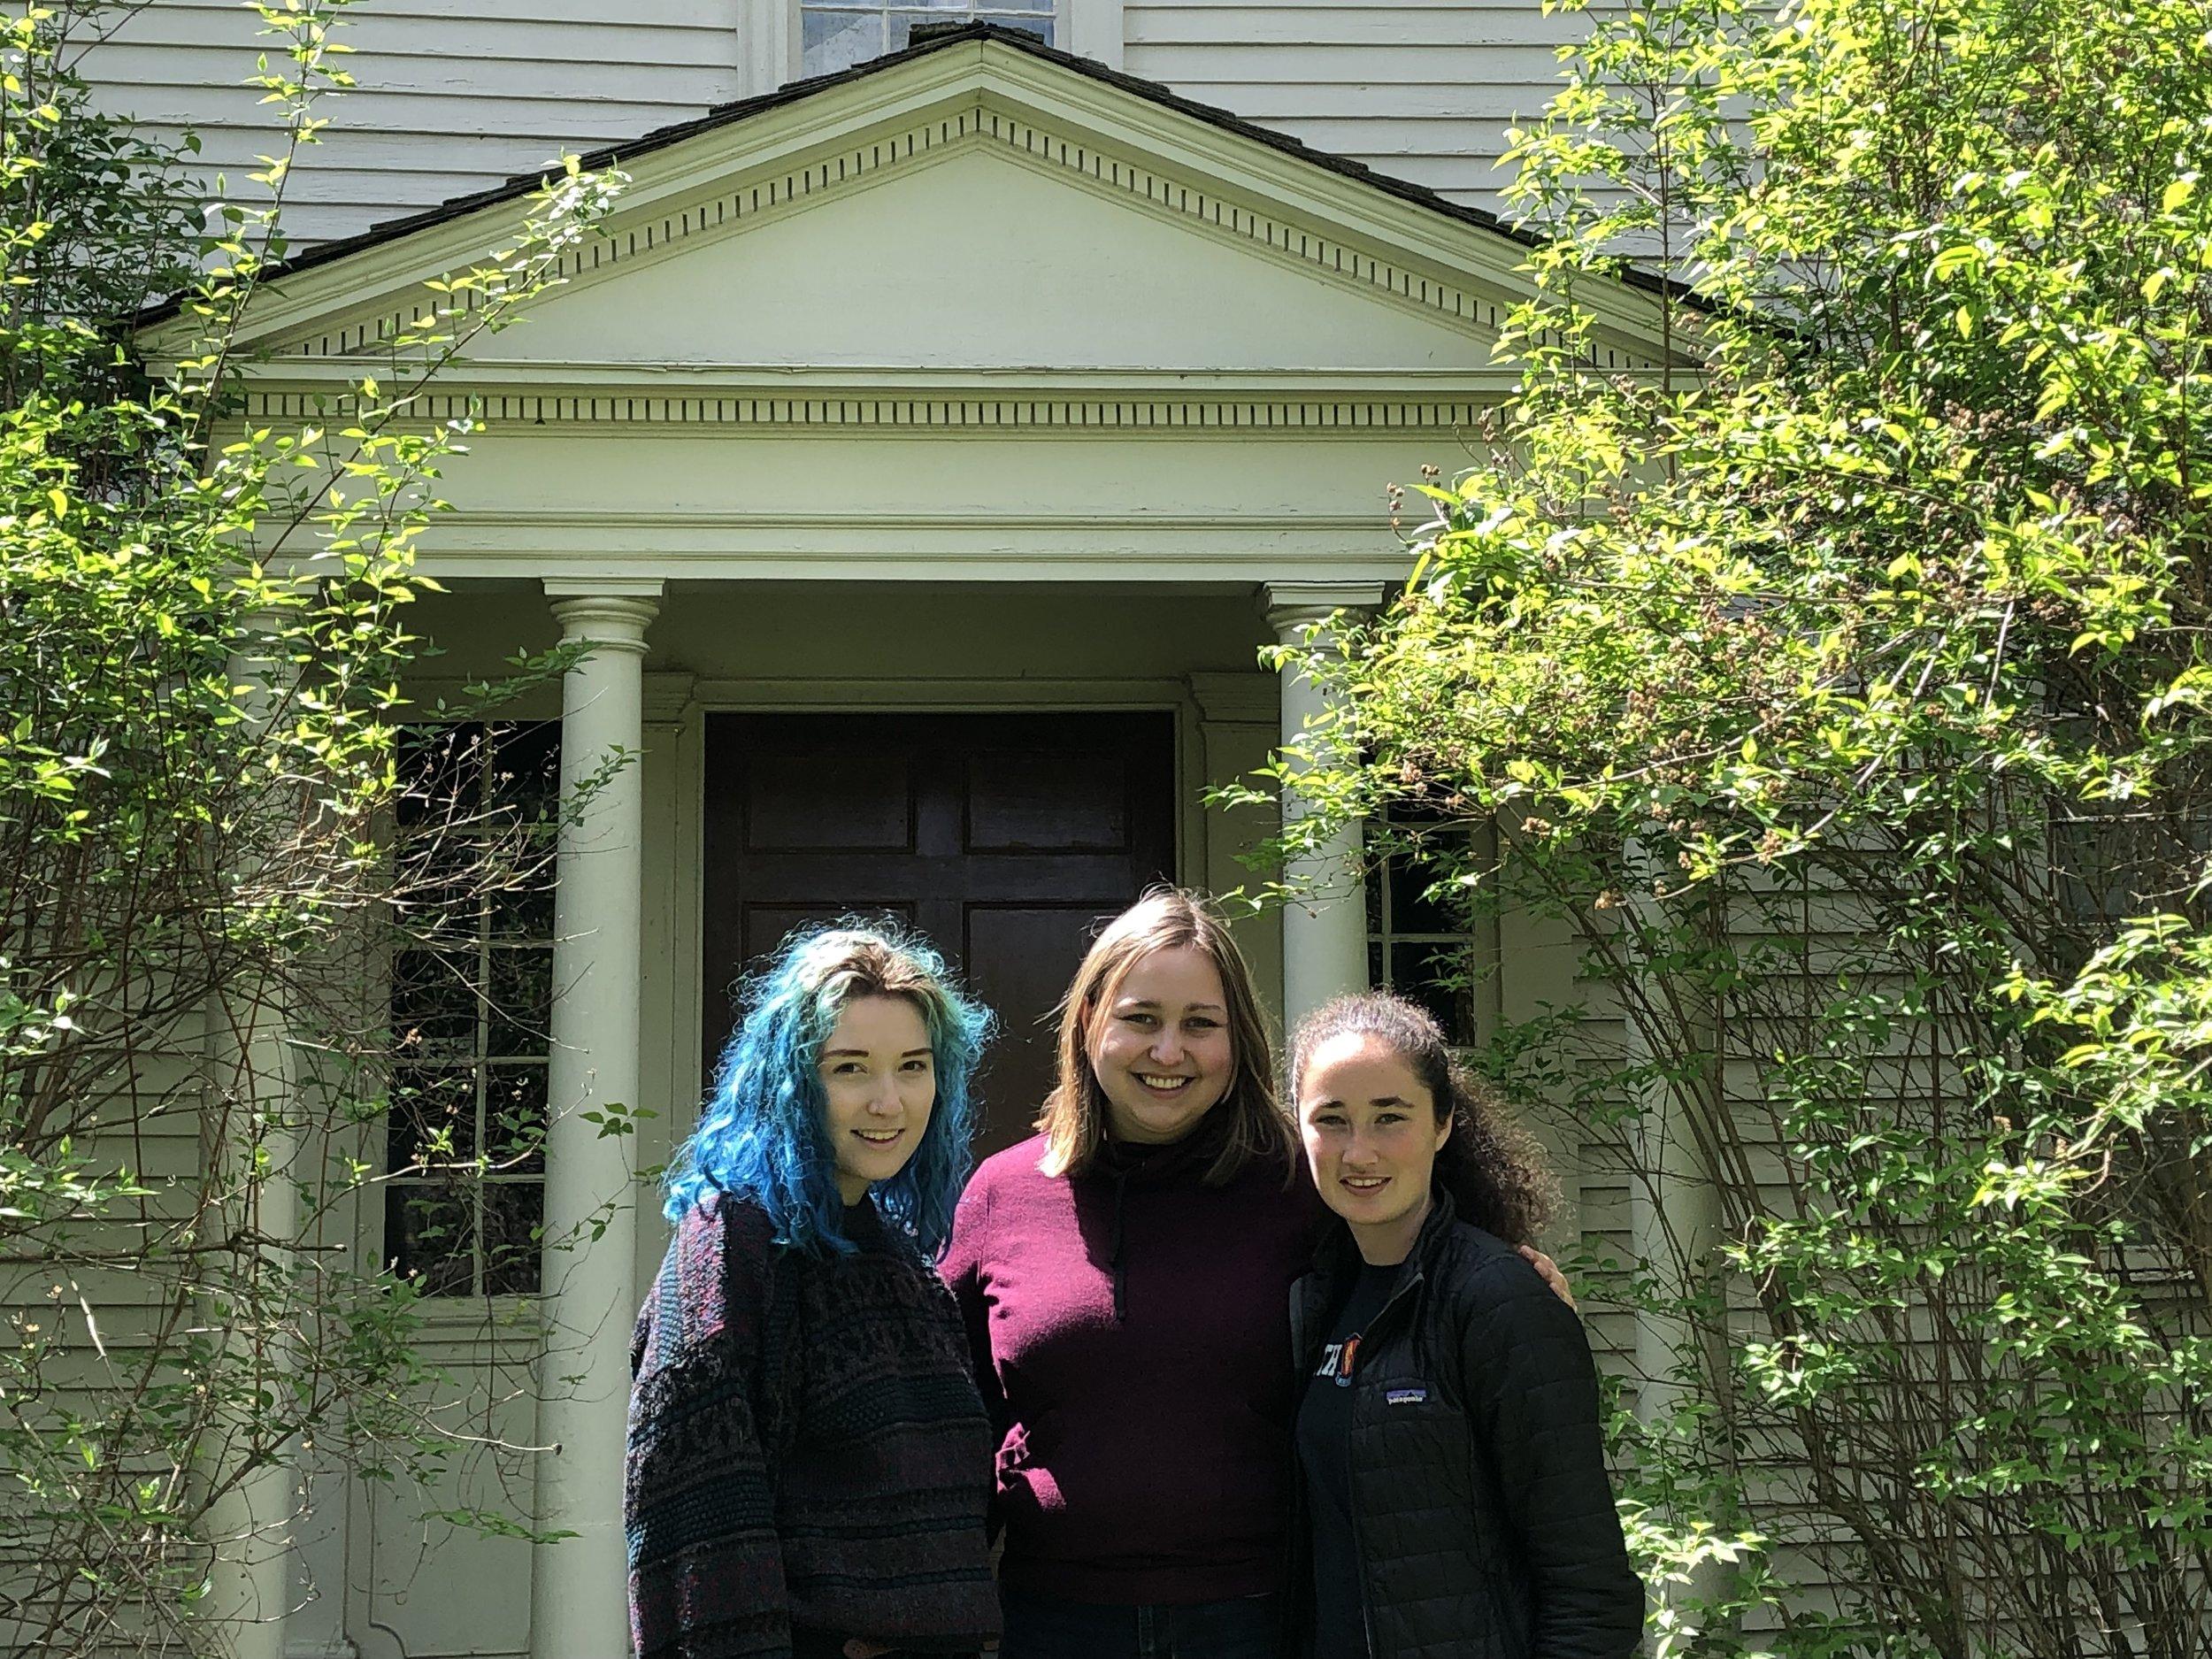 Left to right: Veronica Douglas, Lily Stowe-Alekman, Caroline Smith.